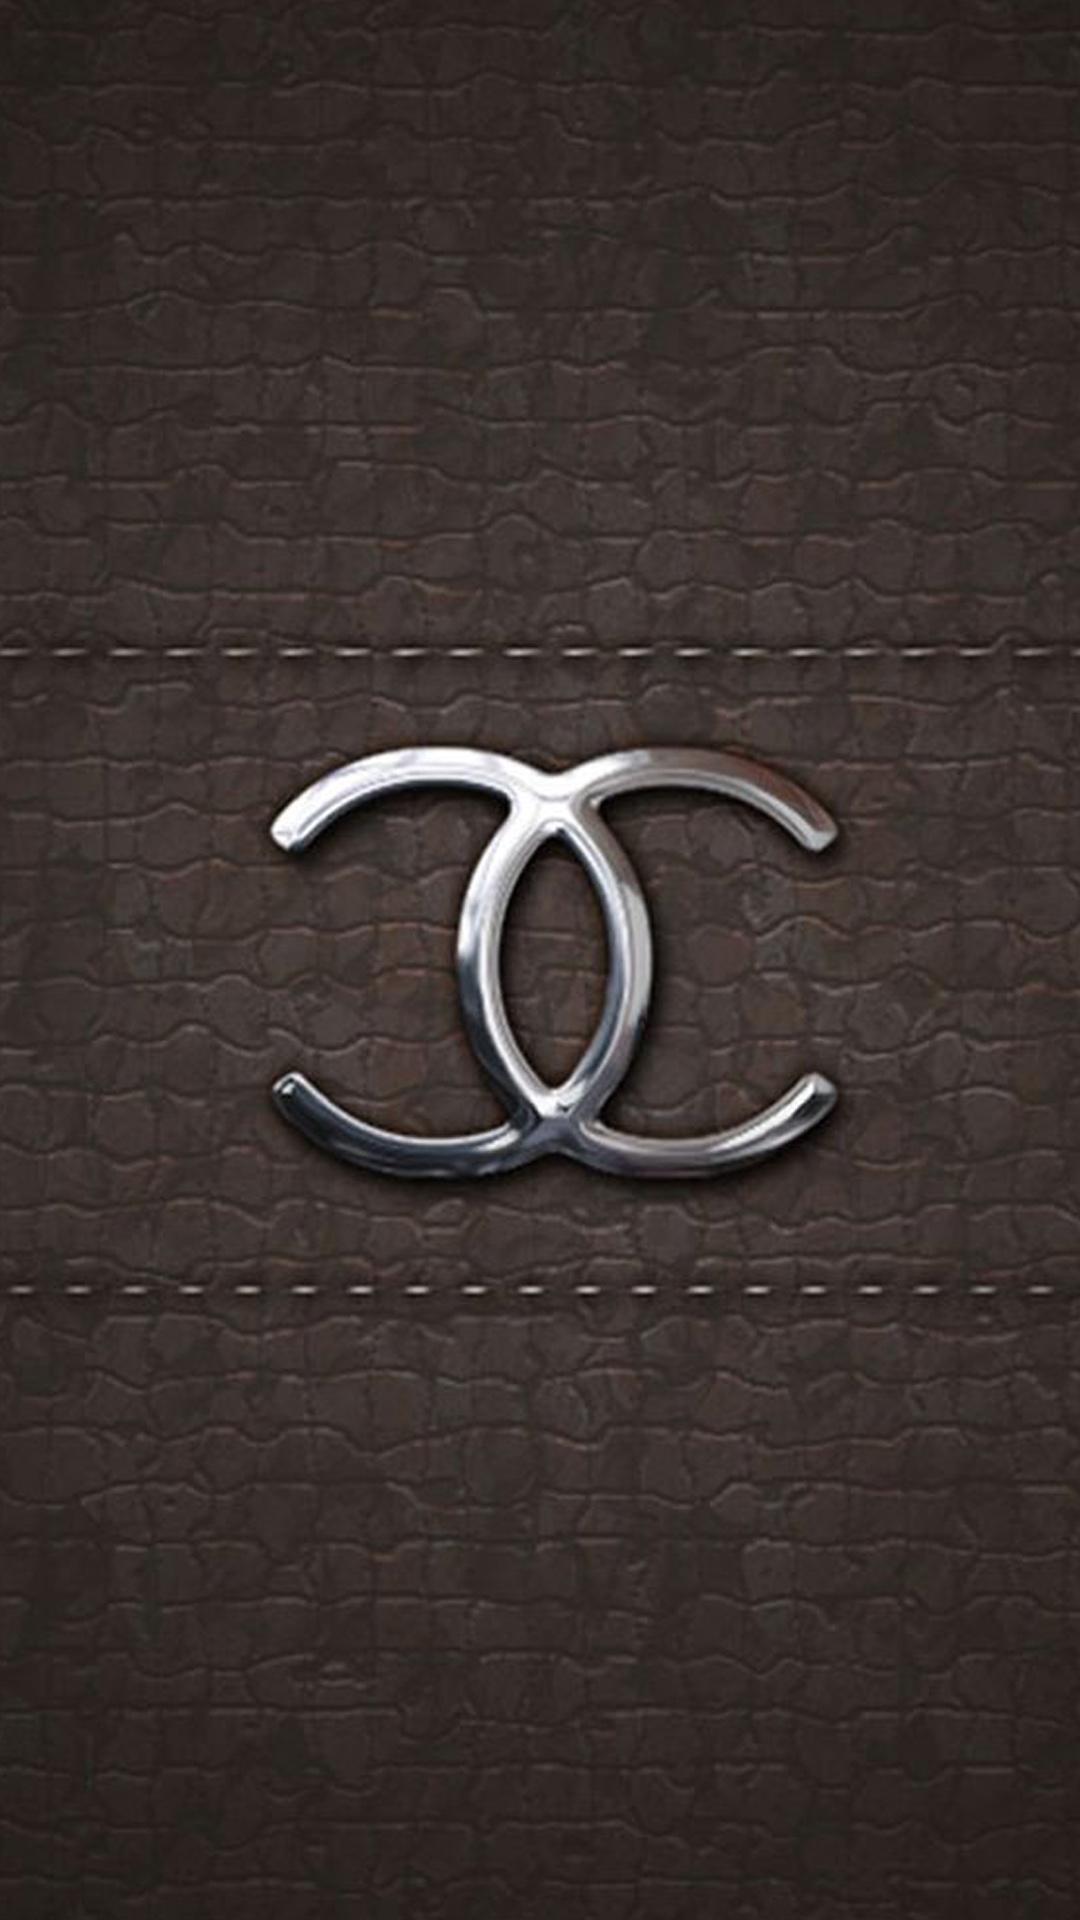 Chanel Chanel Iphone X Wallpaper Brands Iphone Wallpaper